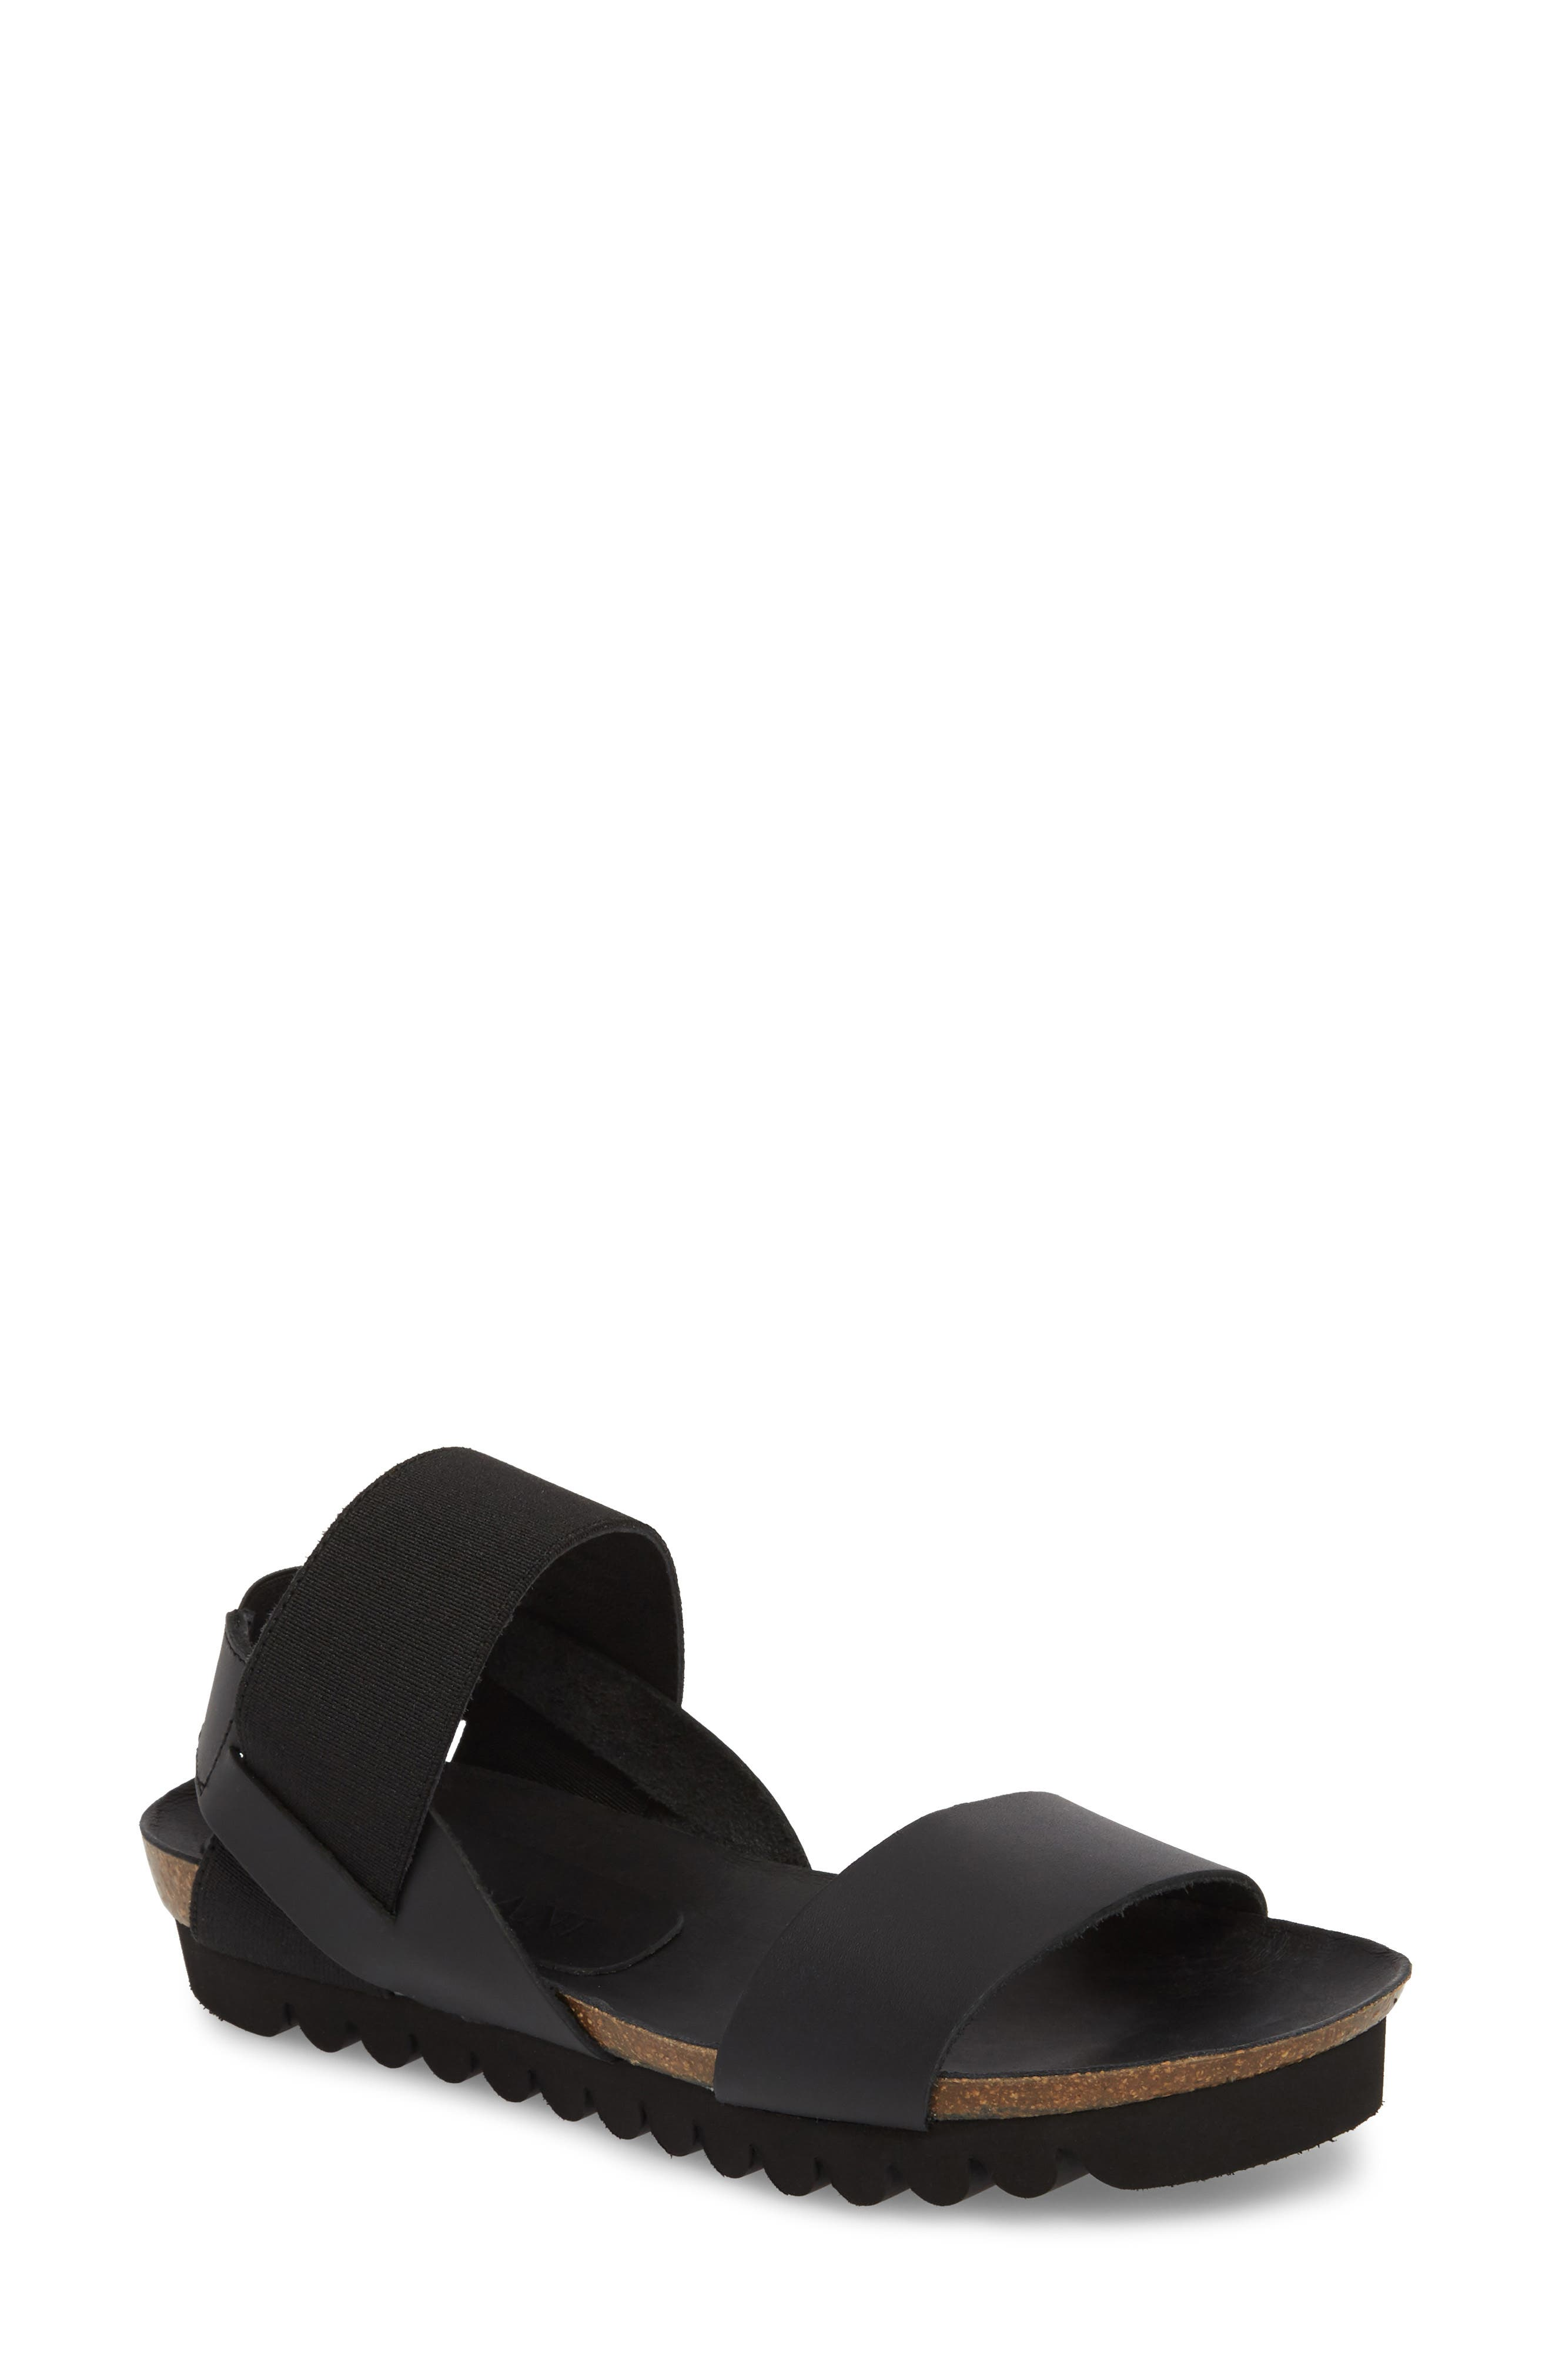 Luna Sandal,                             Main thumbnail 1, color,                             Black Leather